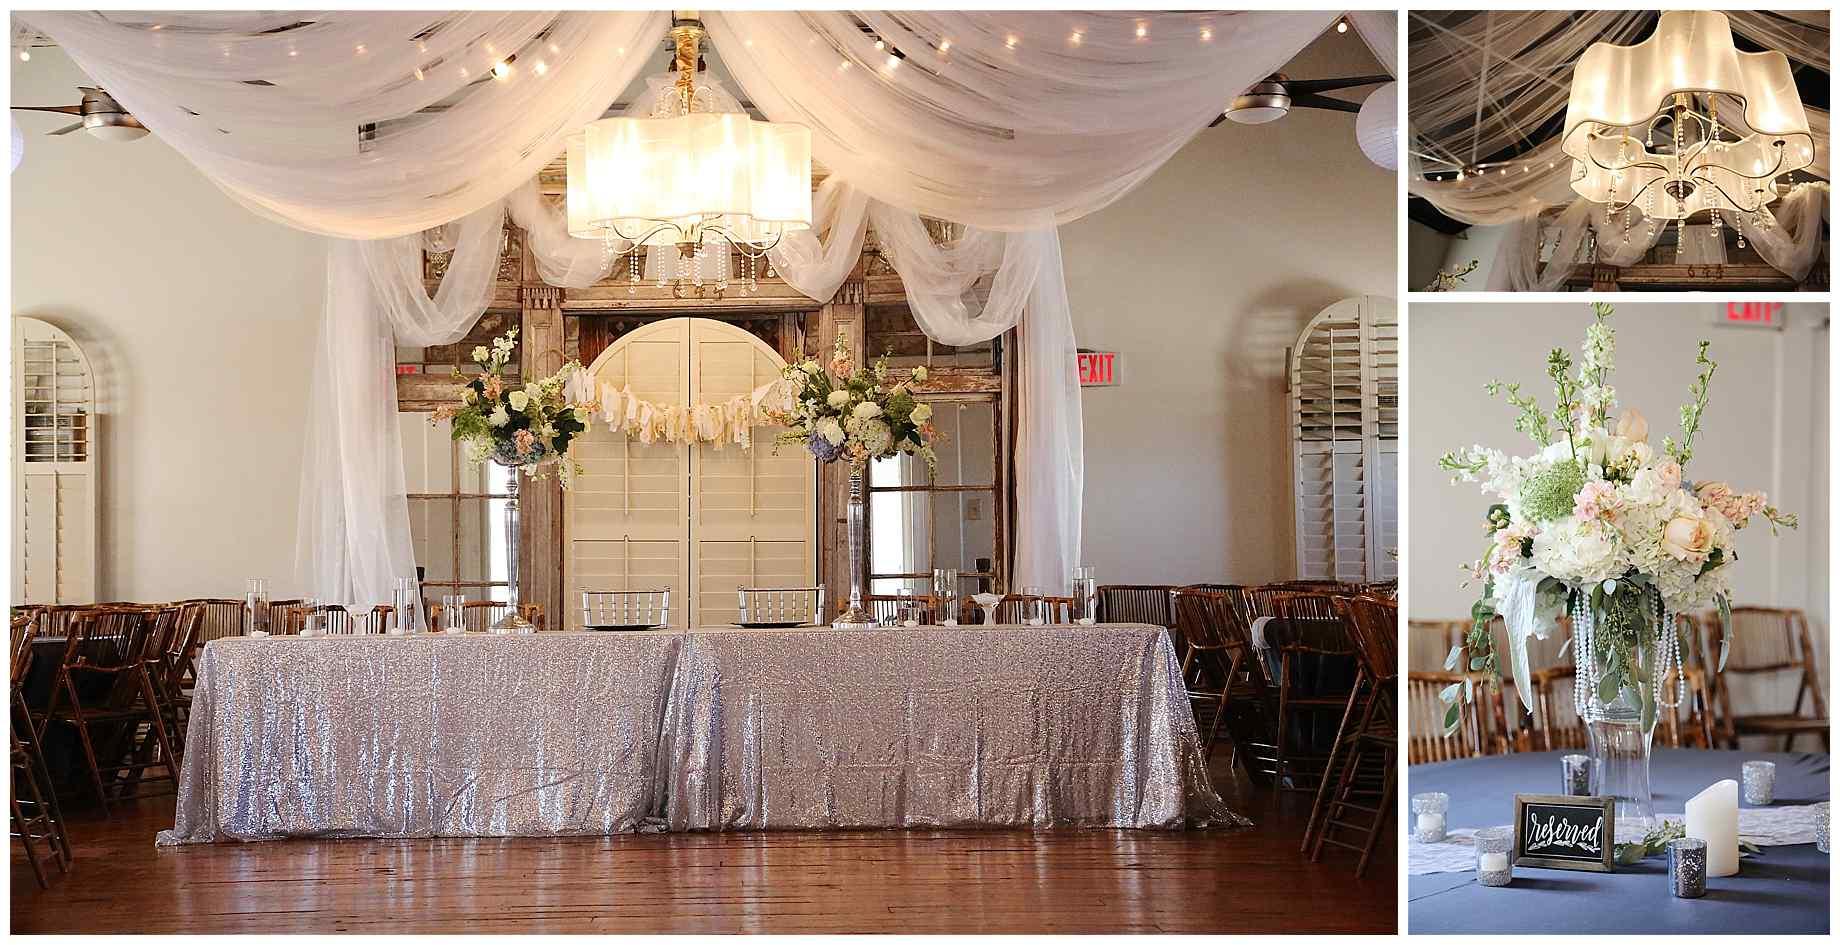 centenary-college-wedding-photos-shreveport-001